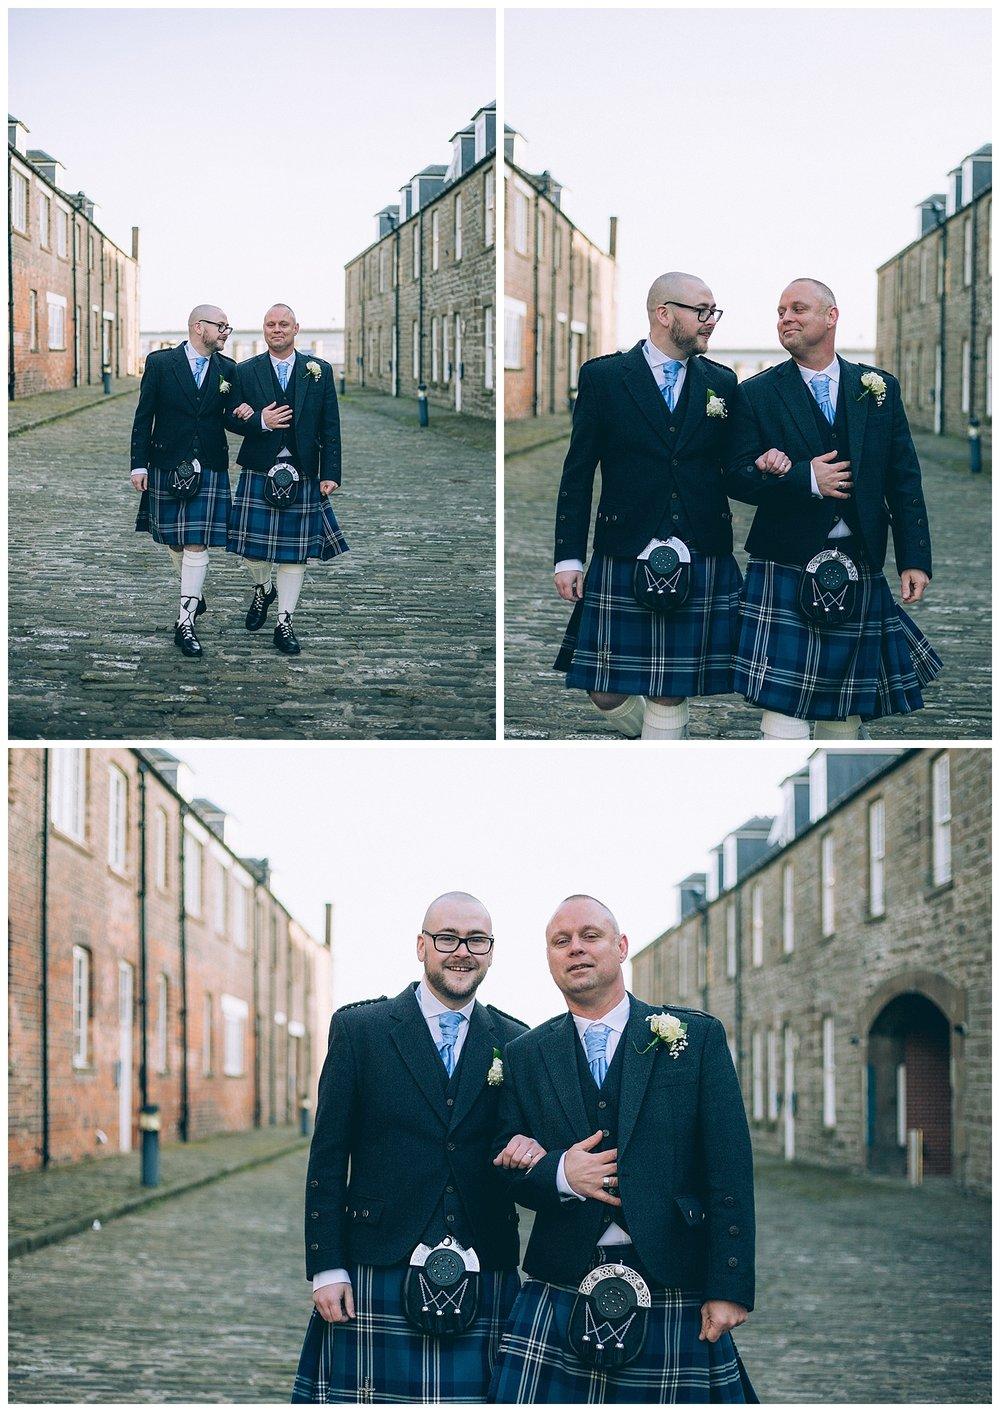 Kirsty_Brown_Wedding_Photography_0025.jpg